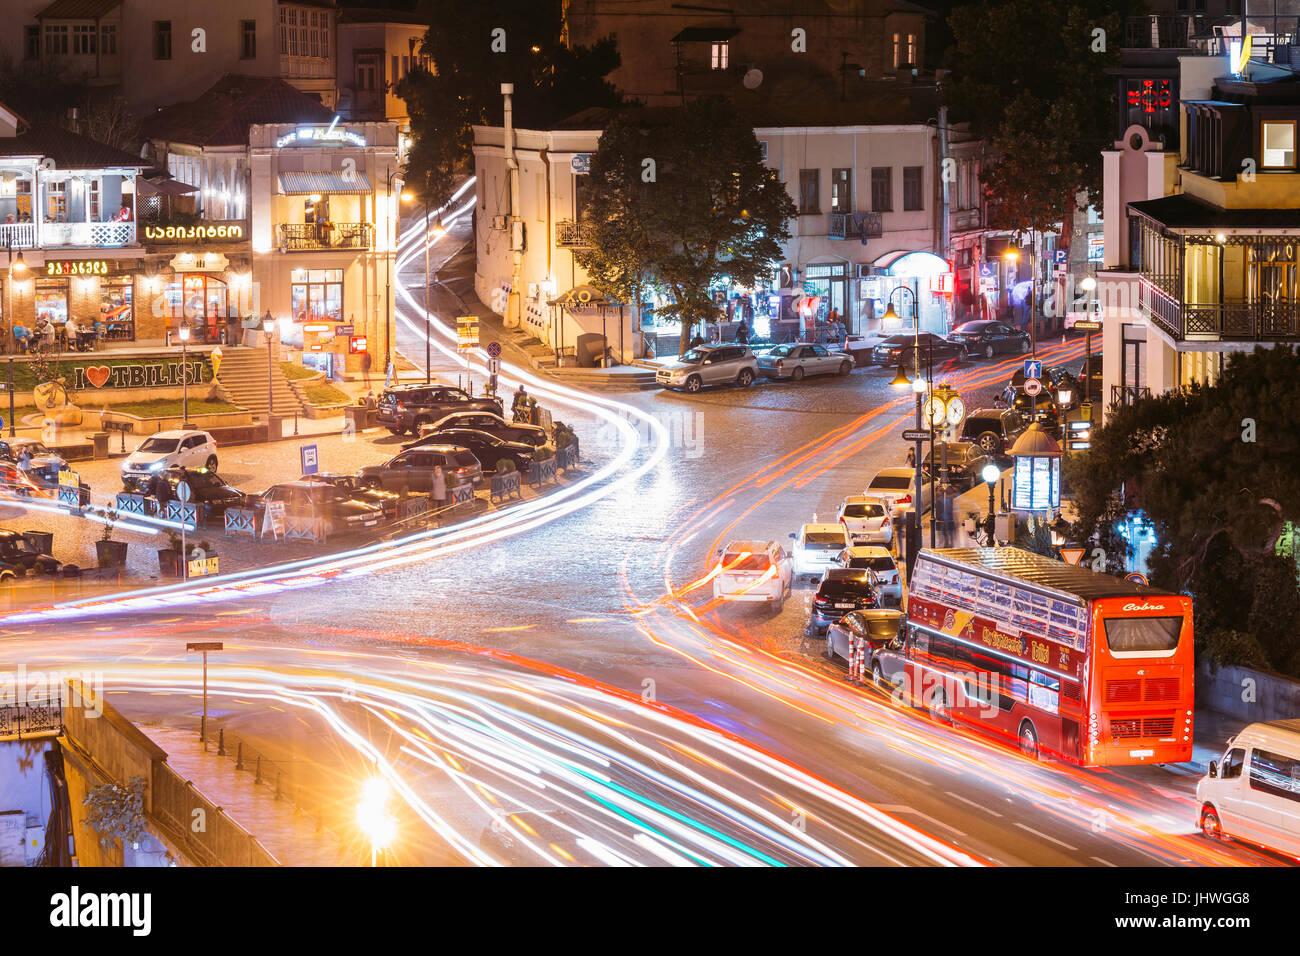 Tbilisi, Georgia - October 21, 2016: Evening Night Scenic Aerial View Of Historic District Abanotubani. Night Traffic - Stock Image